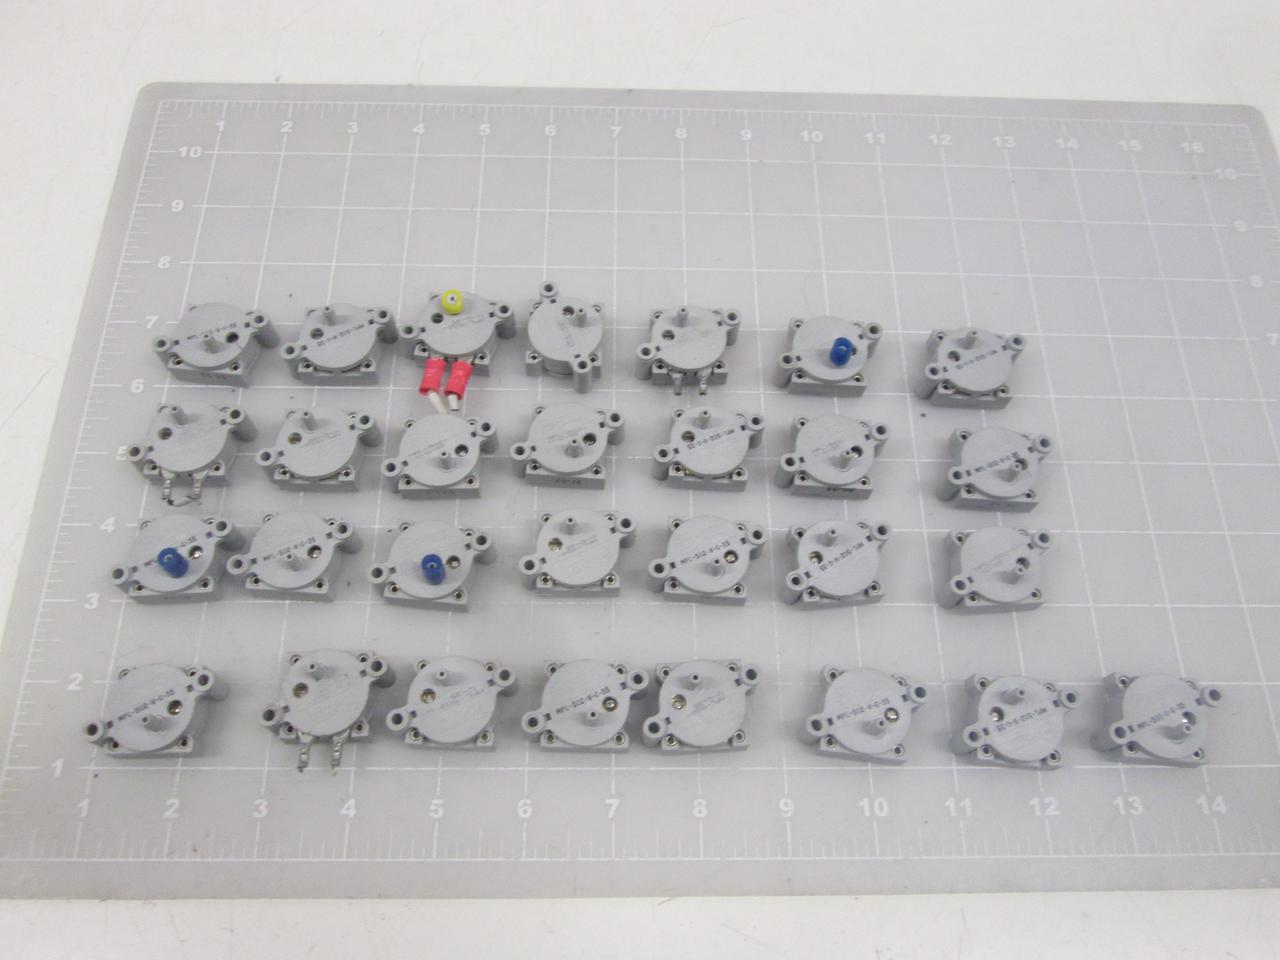 Lot of 29 MPL Micro Pneumatic Logic MPL-502-V-G-35 Pressure Sensor T64458